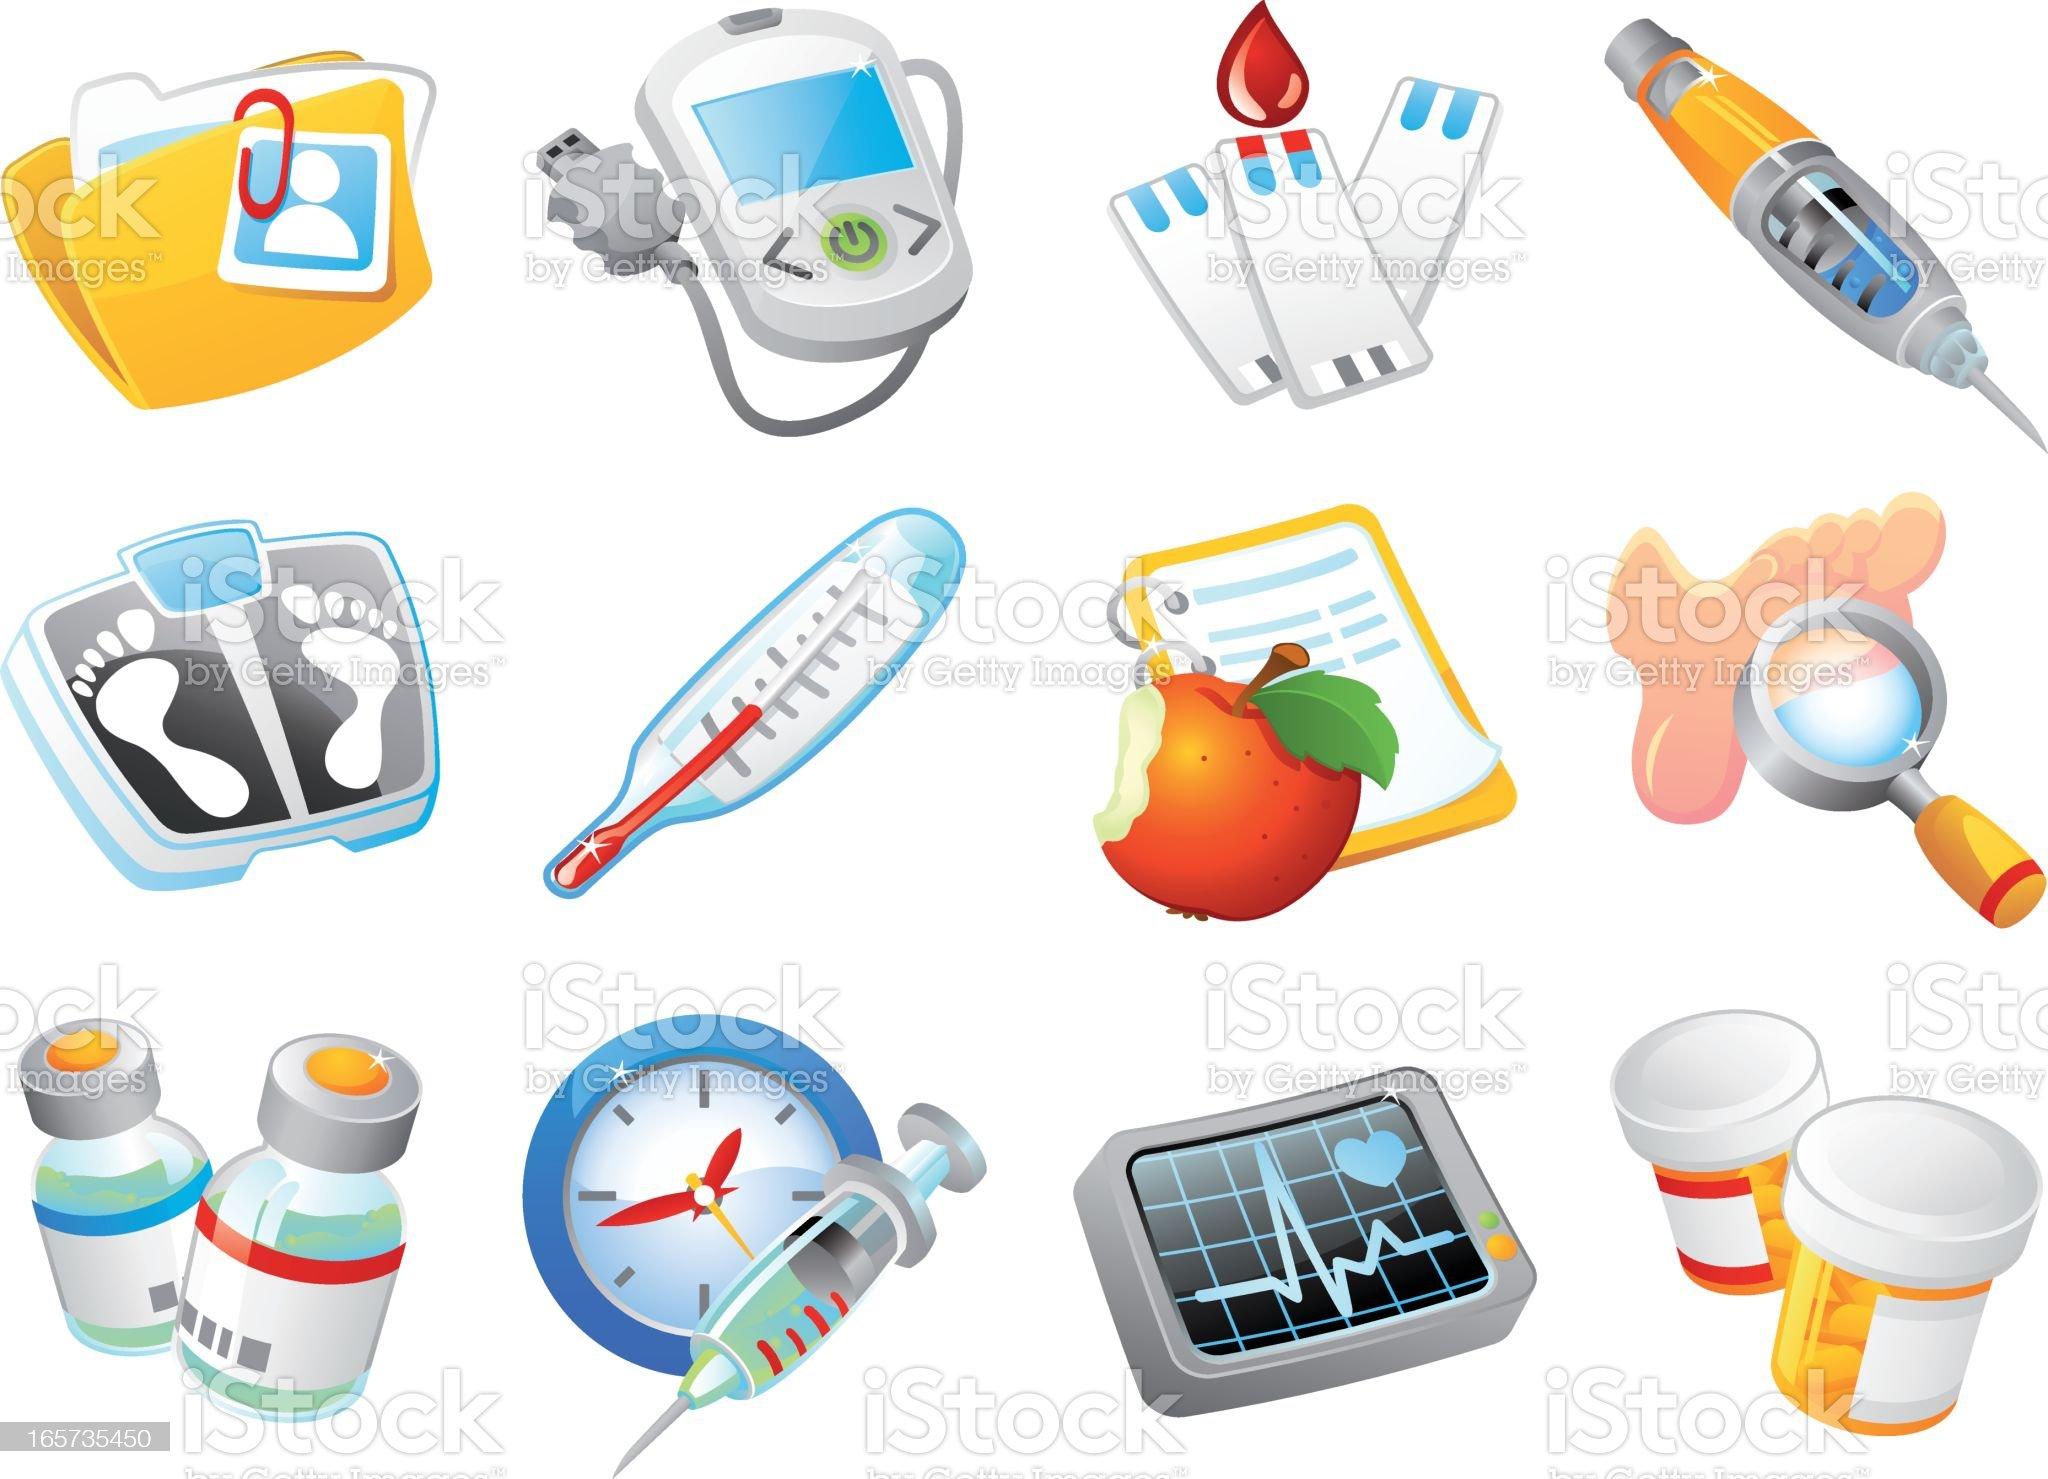 Diabetes Management Icon Set royalty-free stock vector art